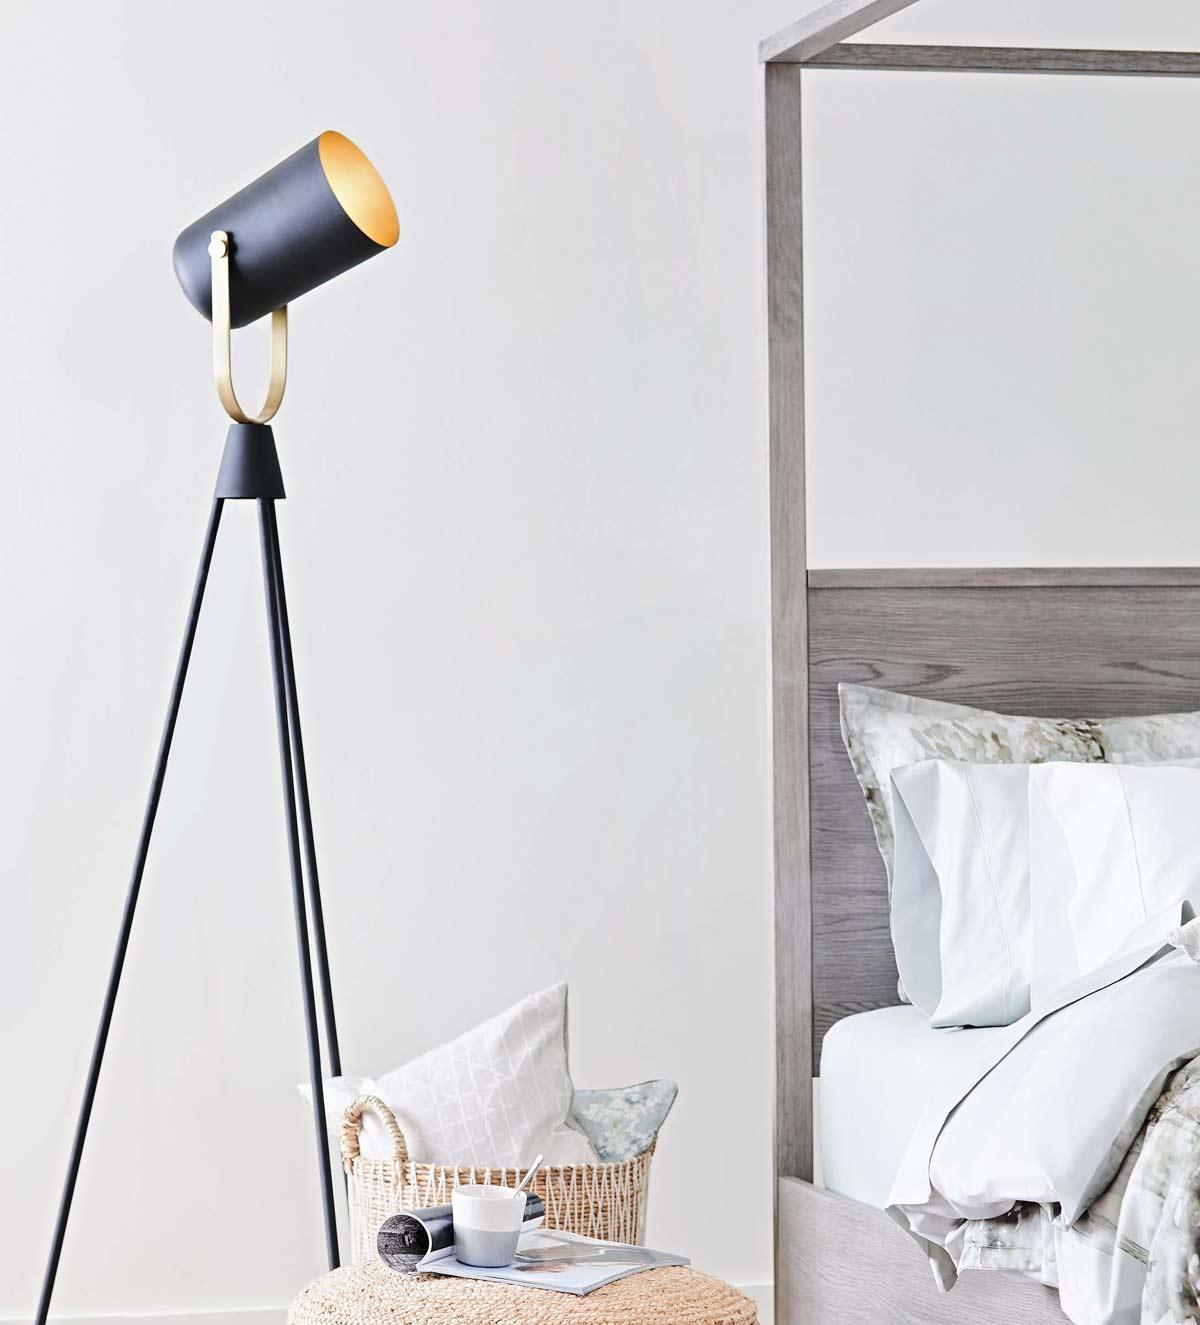 GlucksteinHome | Table & Floor Lamps